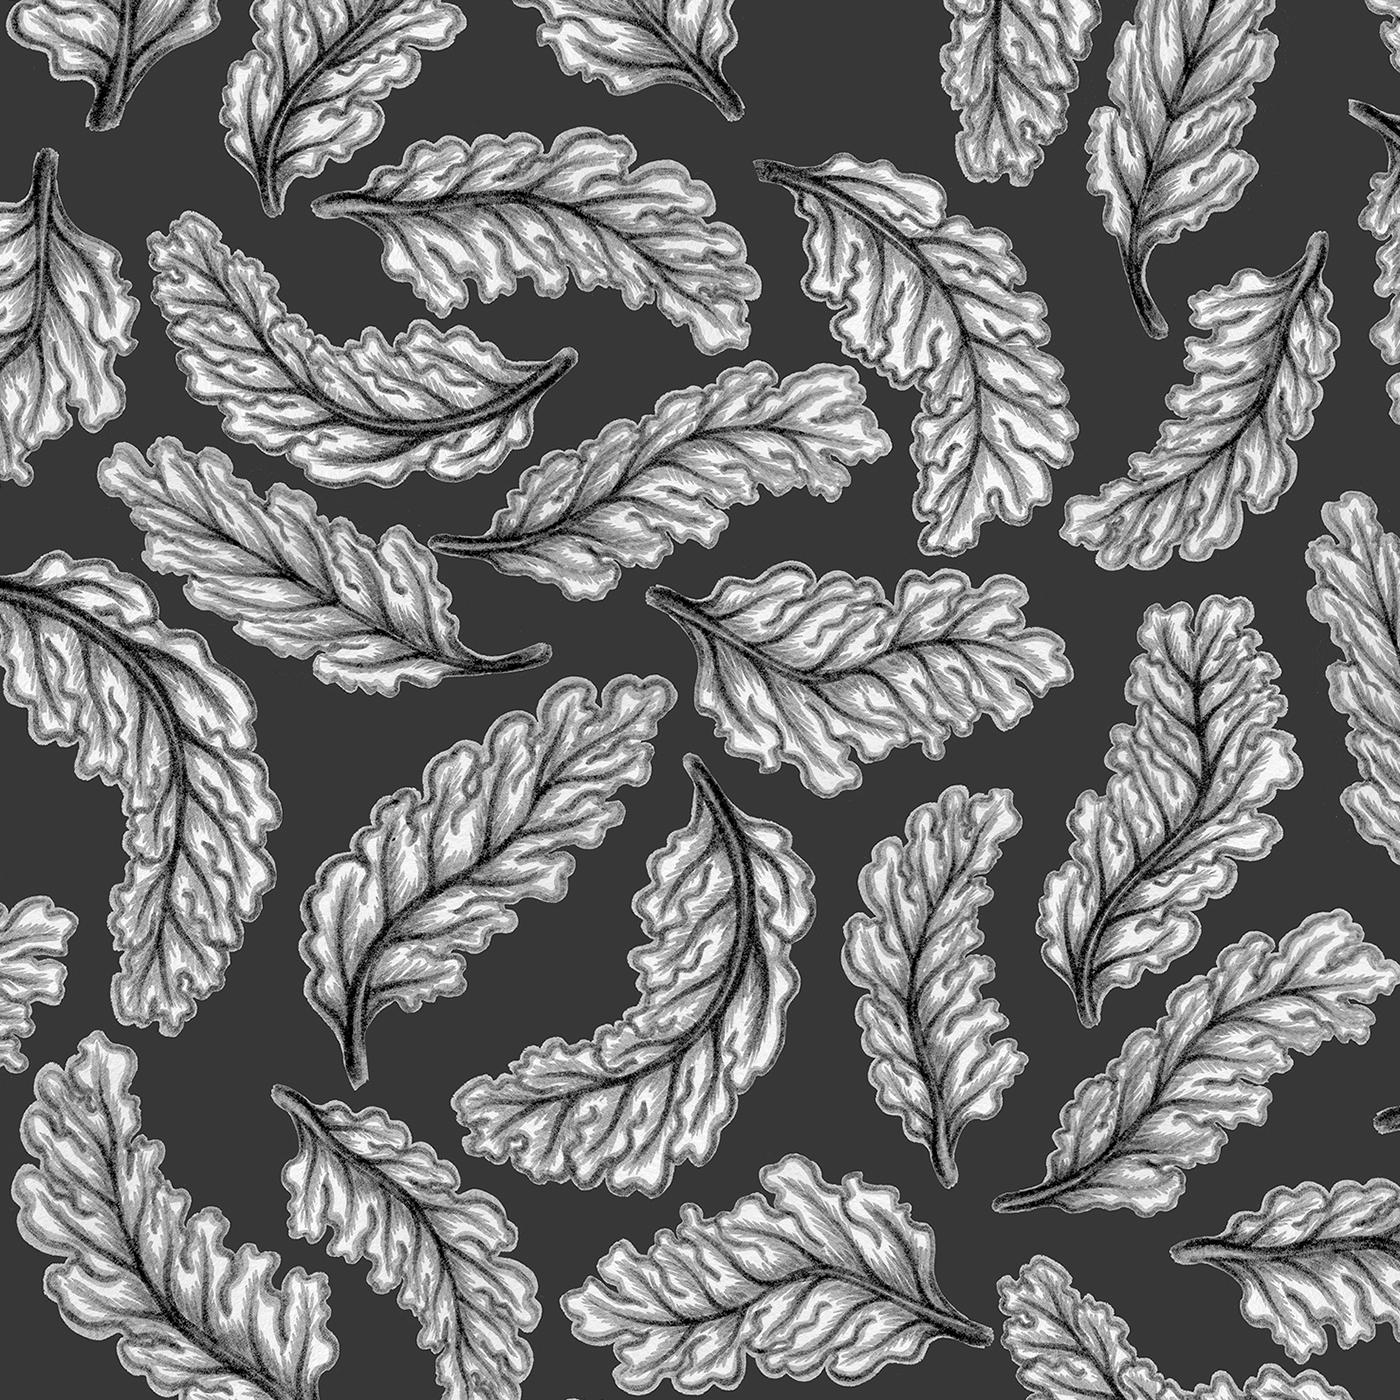 pattern wallpaper design Interior architecture art 3D organic decor Render